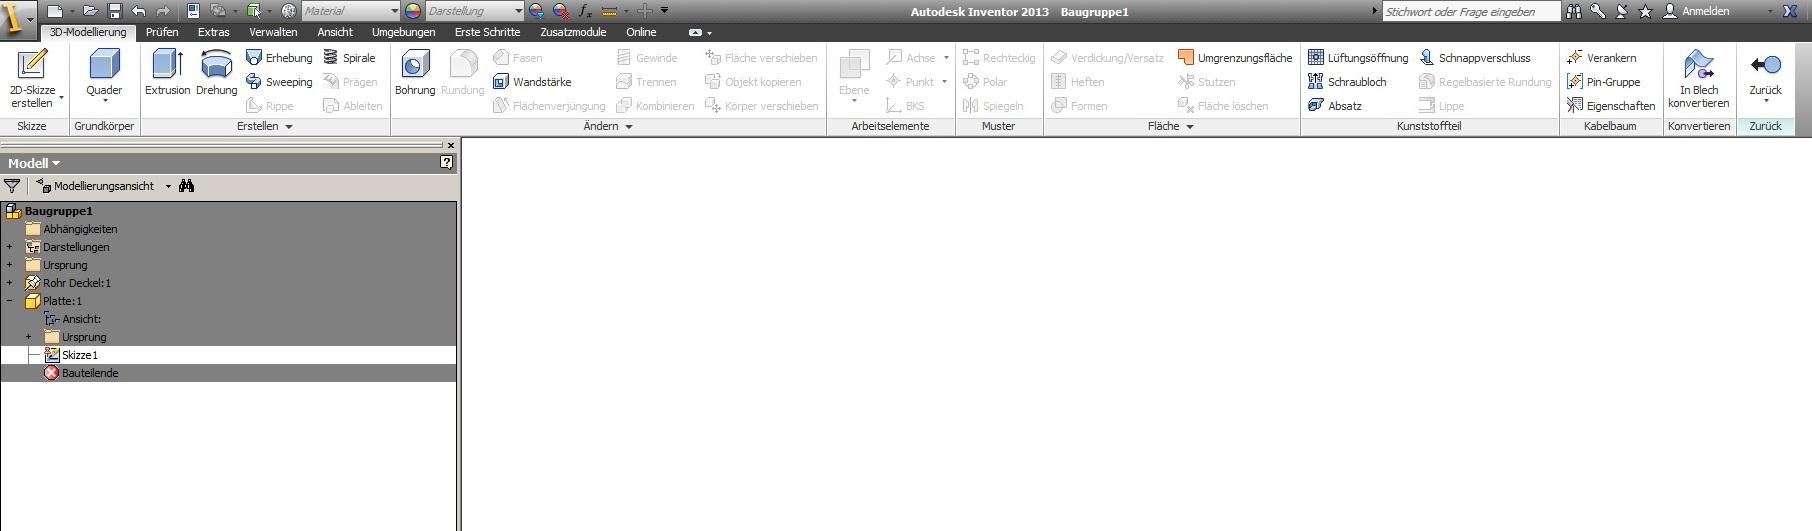 Bauteil erstellen, Problem mit Skizze (Autodesk/Inventor) - AUGCE.de